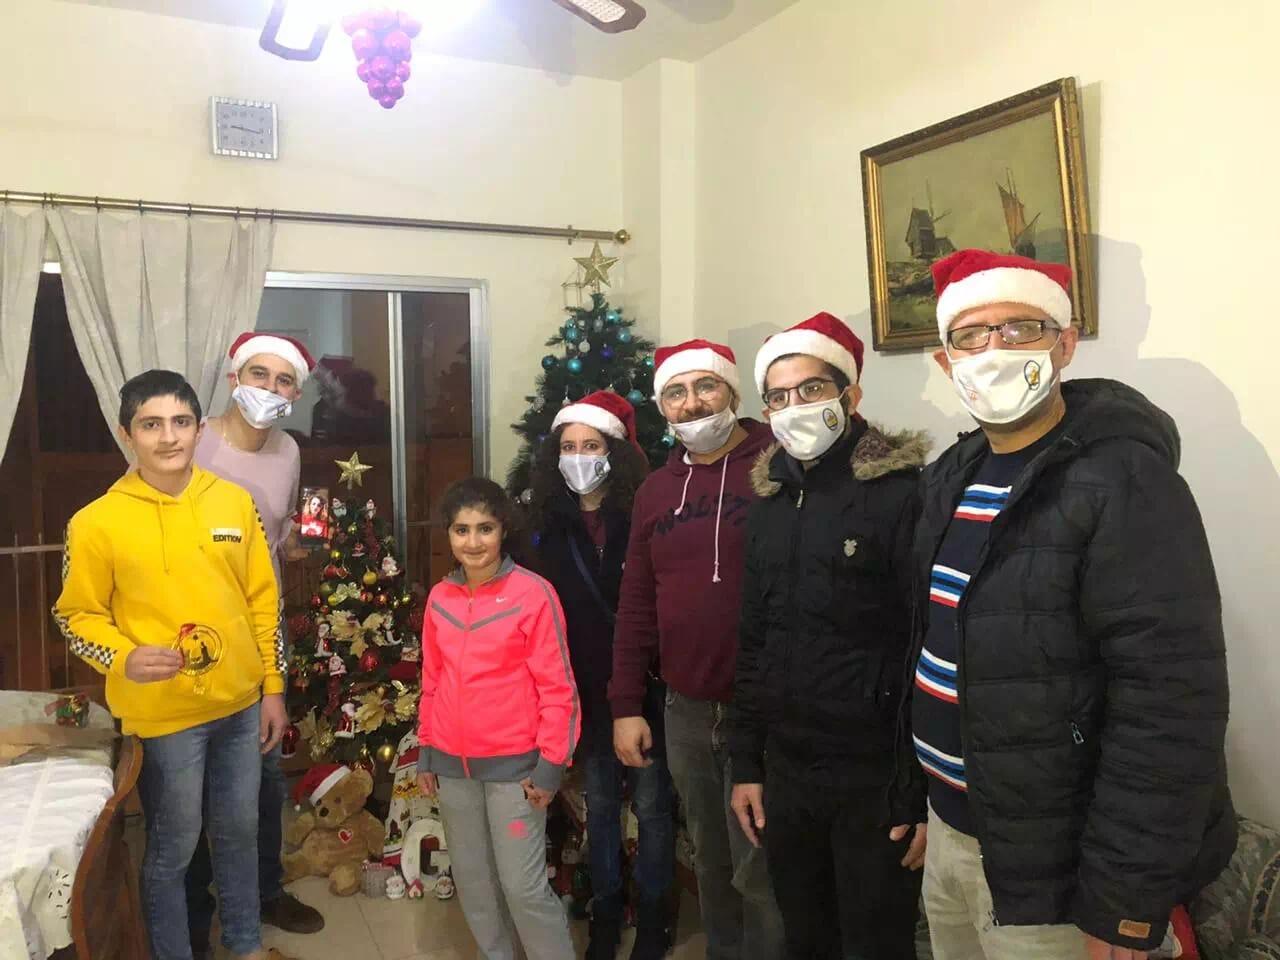 https://eundemia.sirv.com/Images/christmas/456912.webp